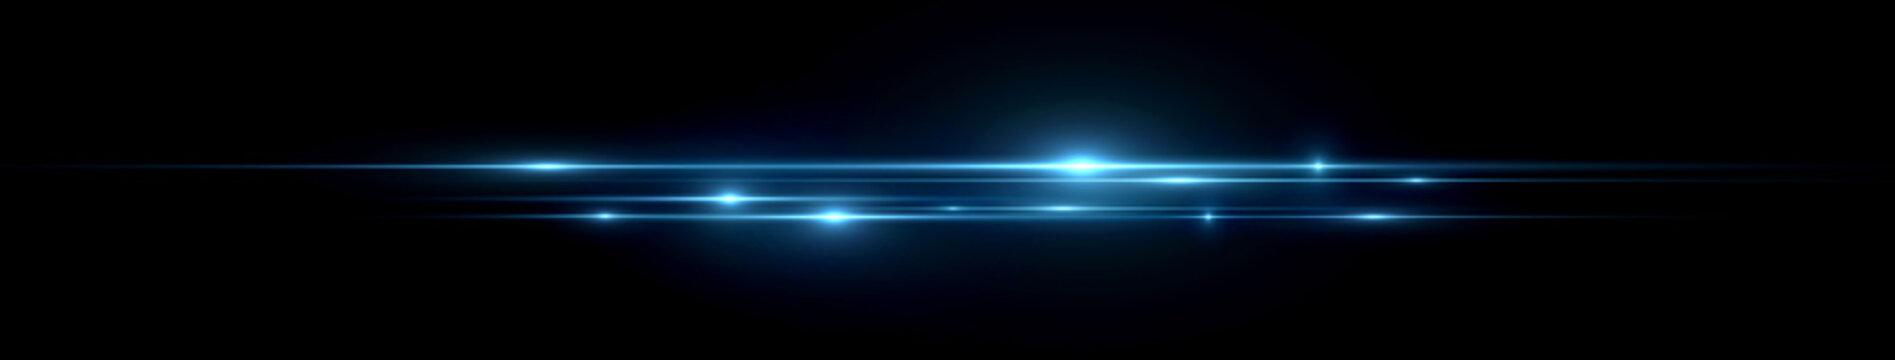 Beautiful light flares. Glowing streaks dark background. Luminous abstract sparkling lined background. .Light effect wallpaper. Elegant style.  Сoncert light